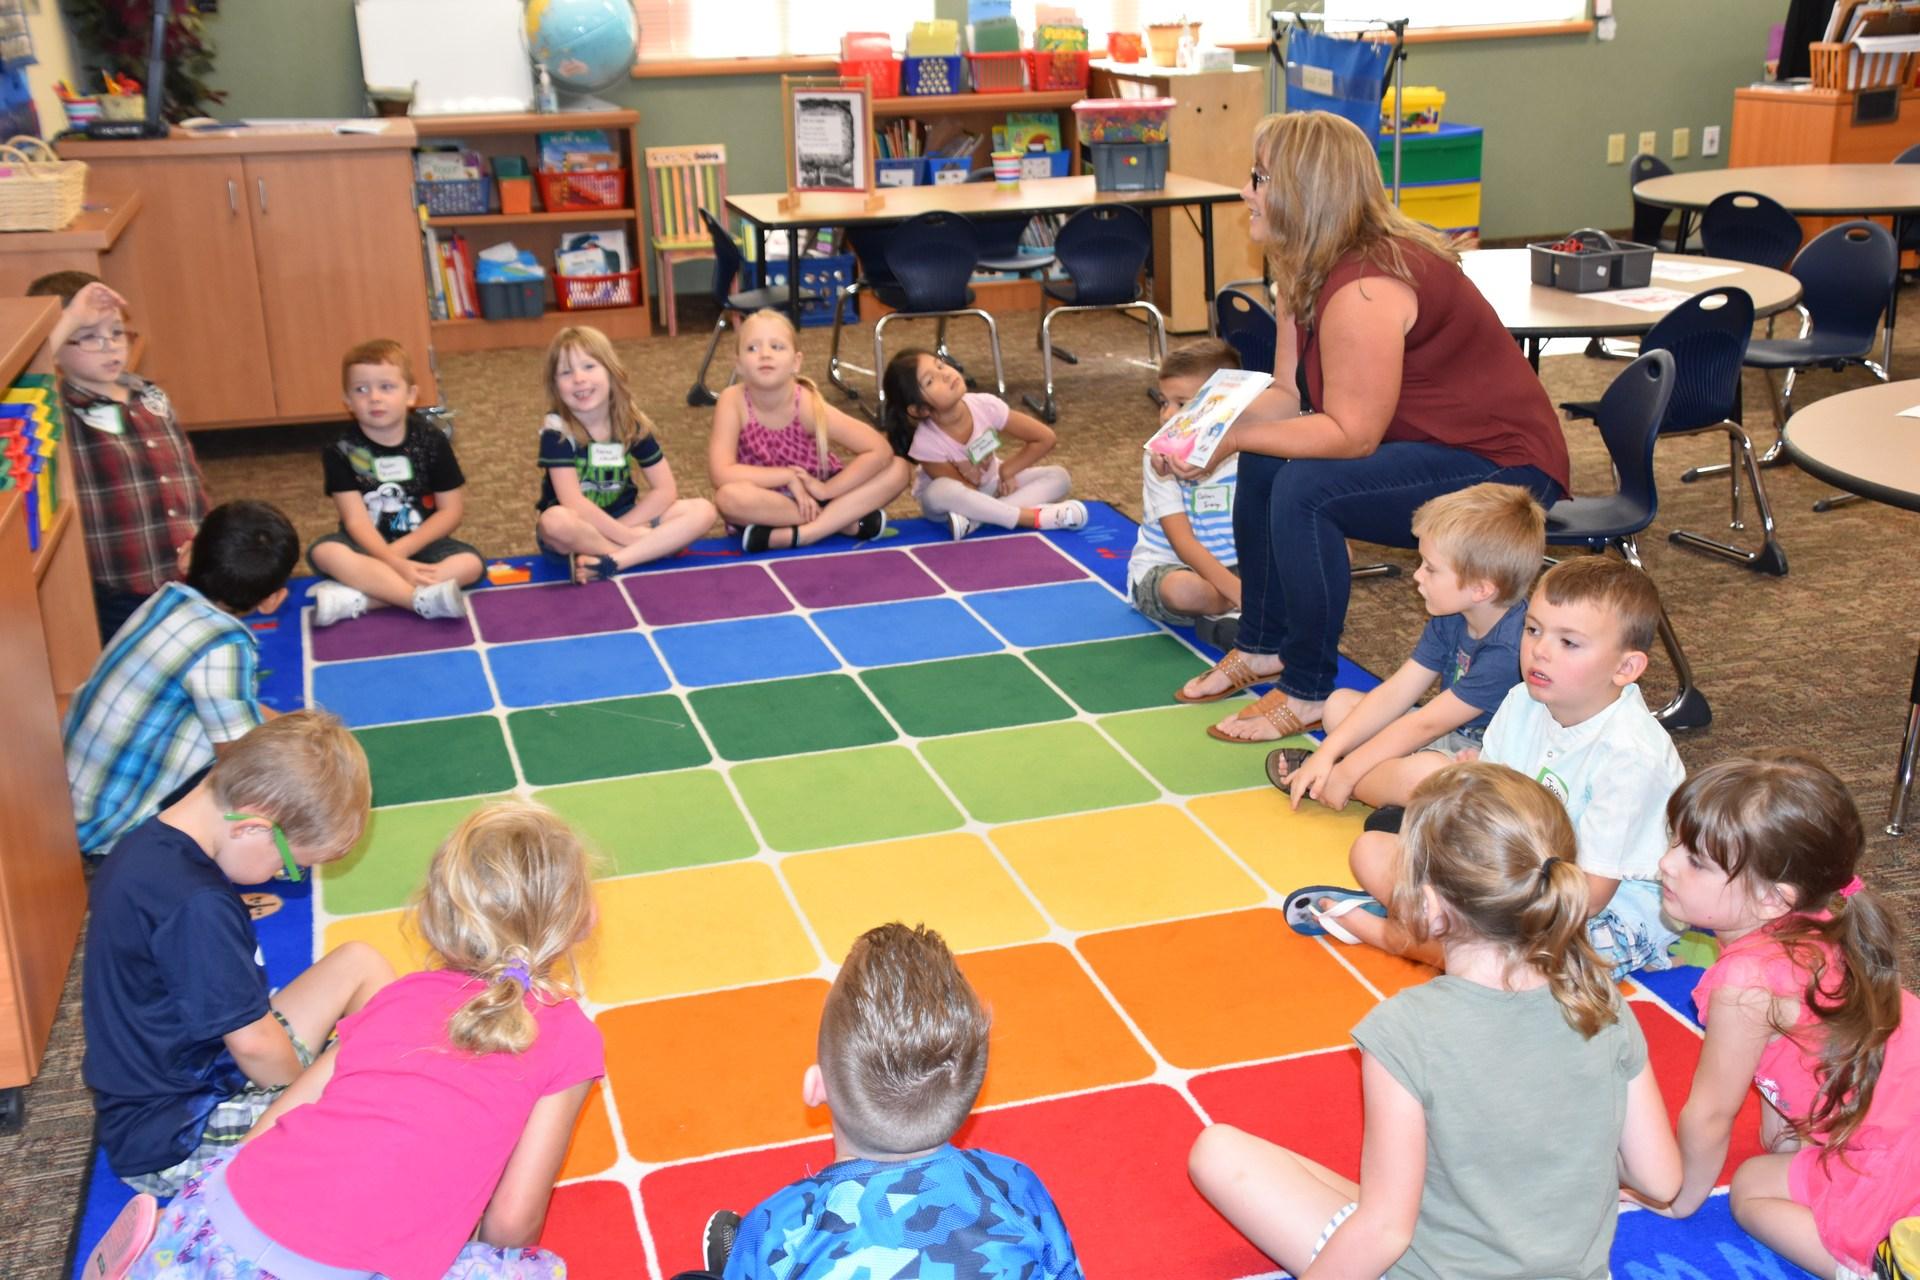 Carpet time at Kindergarten orientation